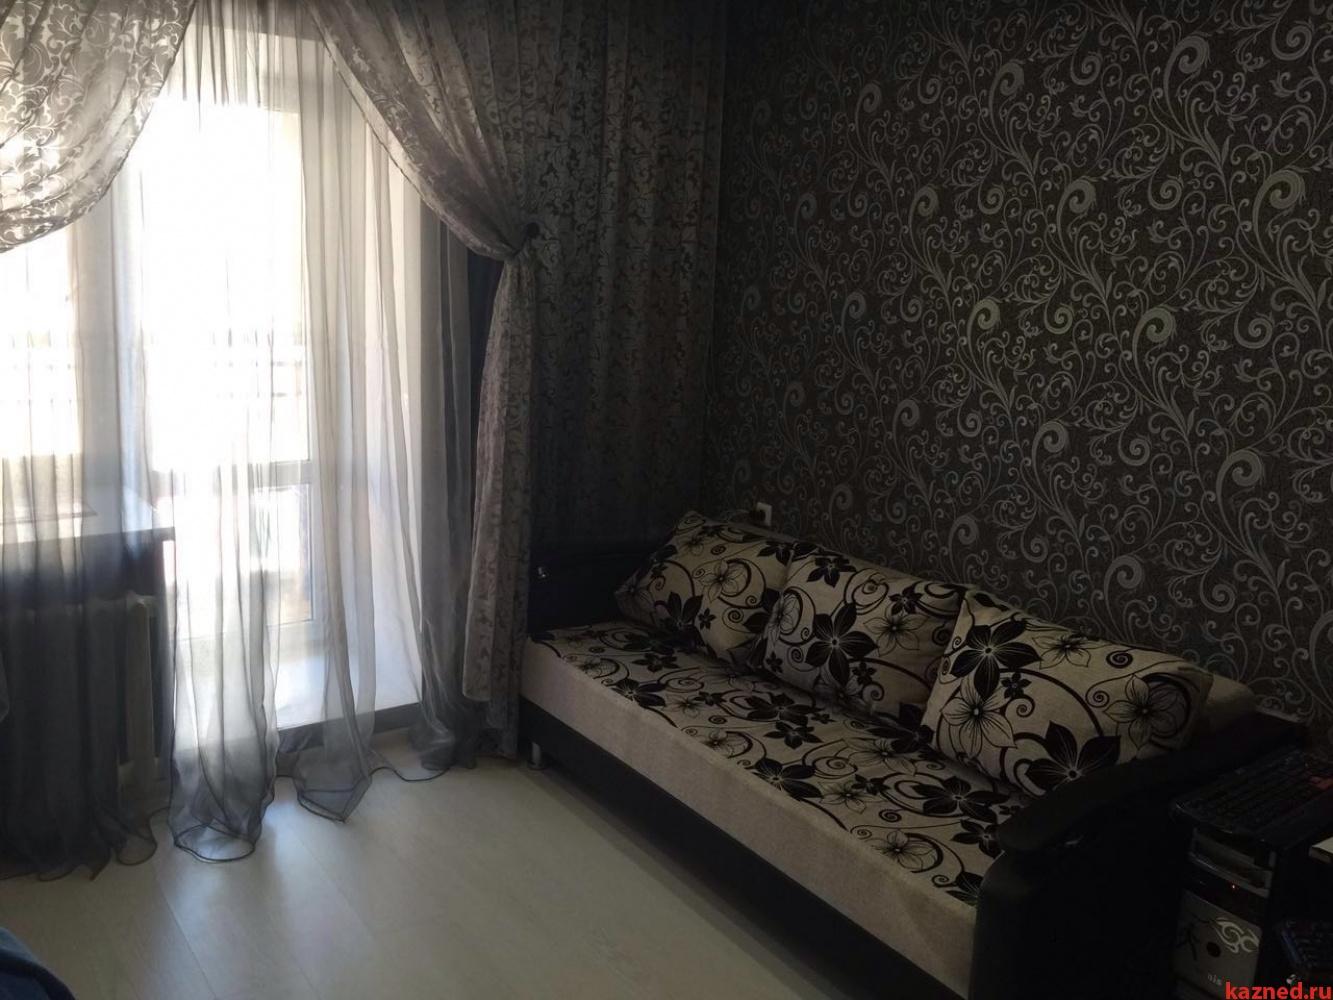 Продажа 3-к квартиры Гарифа Ахунова, 18, 88 м²  (миниатюра №2)